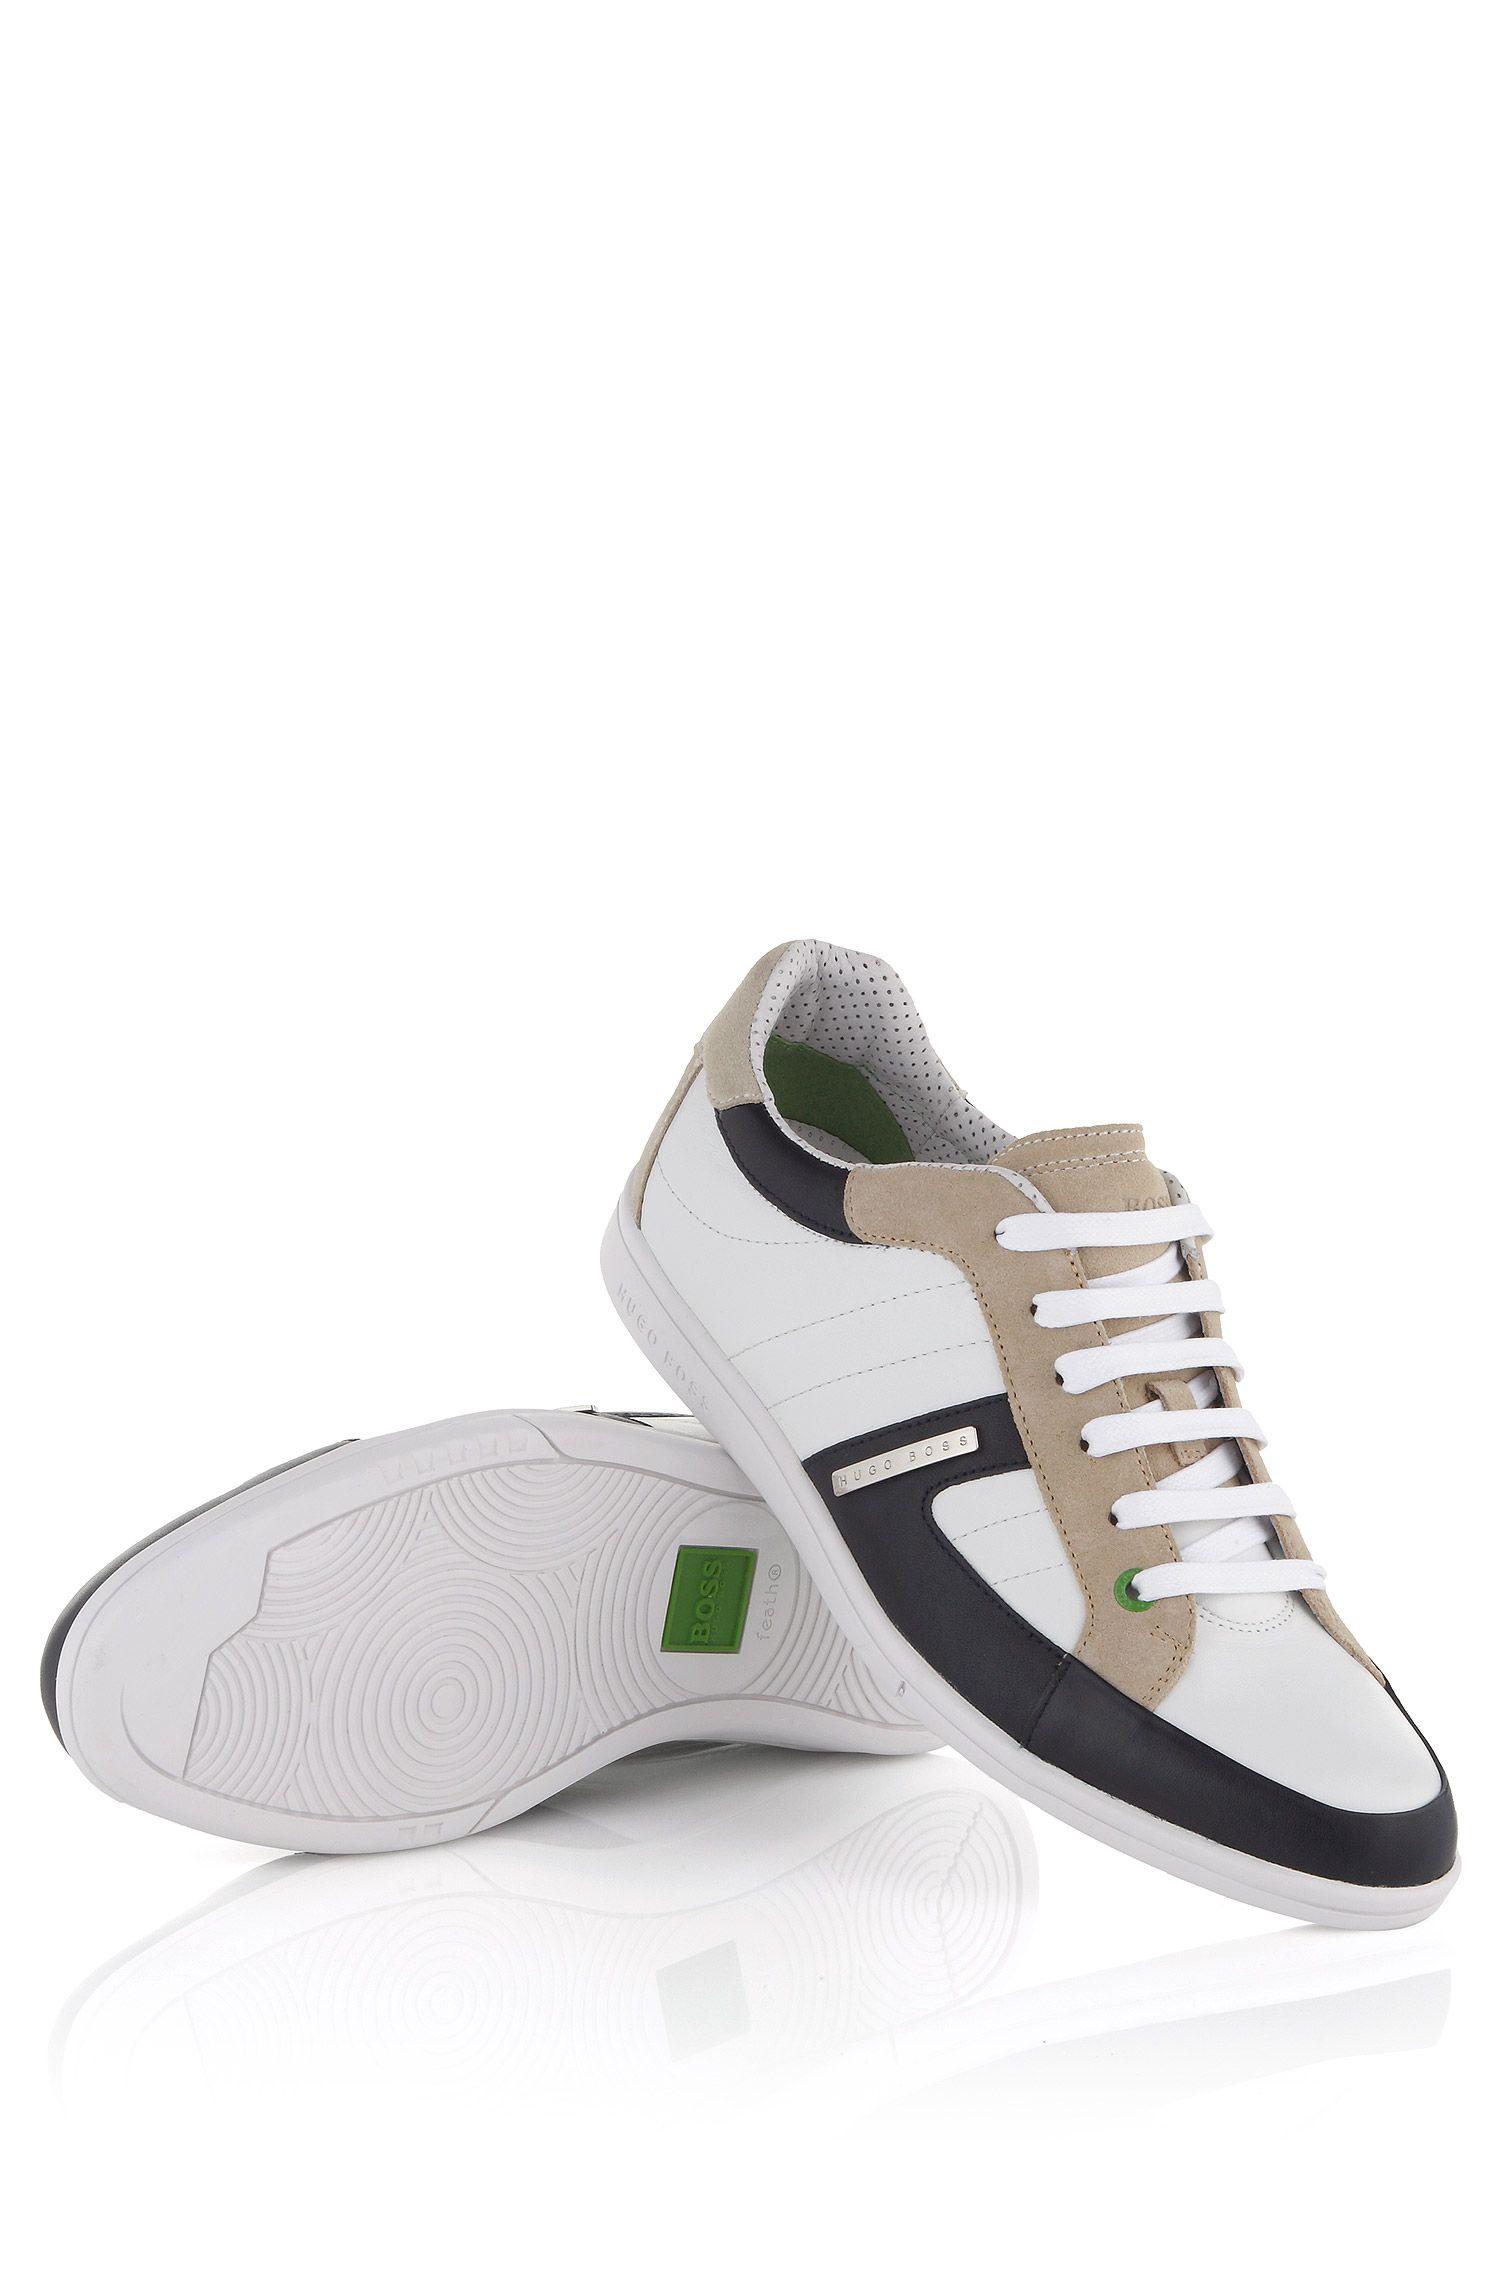 Ledersneaker ´Eldorado Safari` mit Schnürung